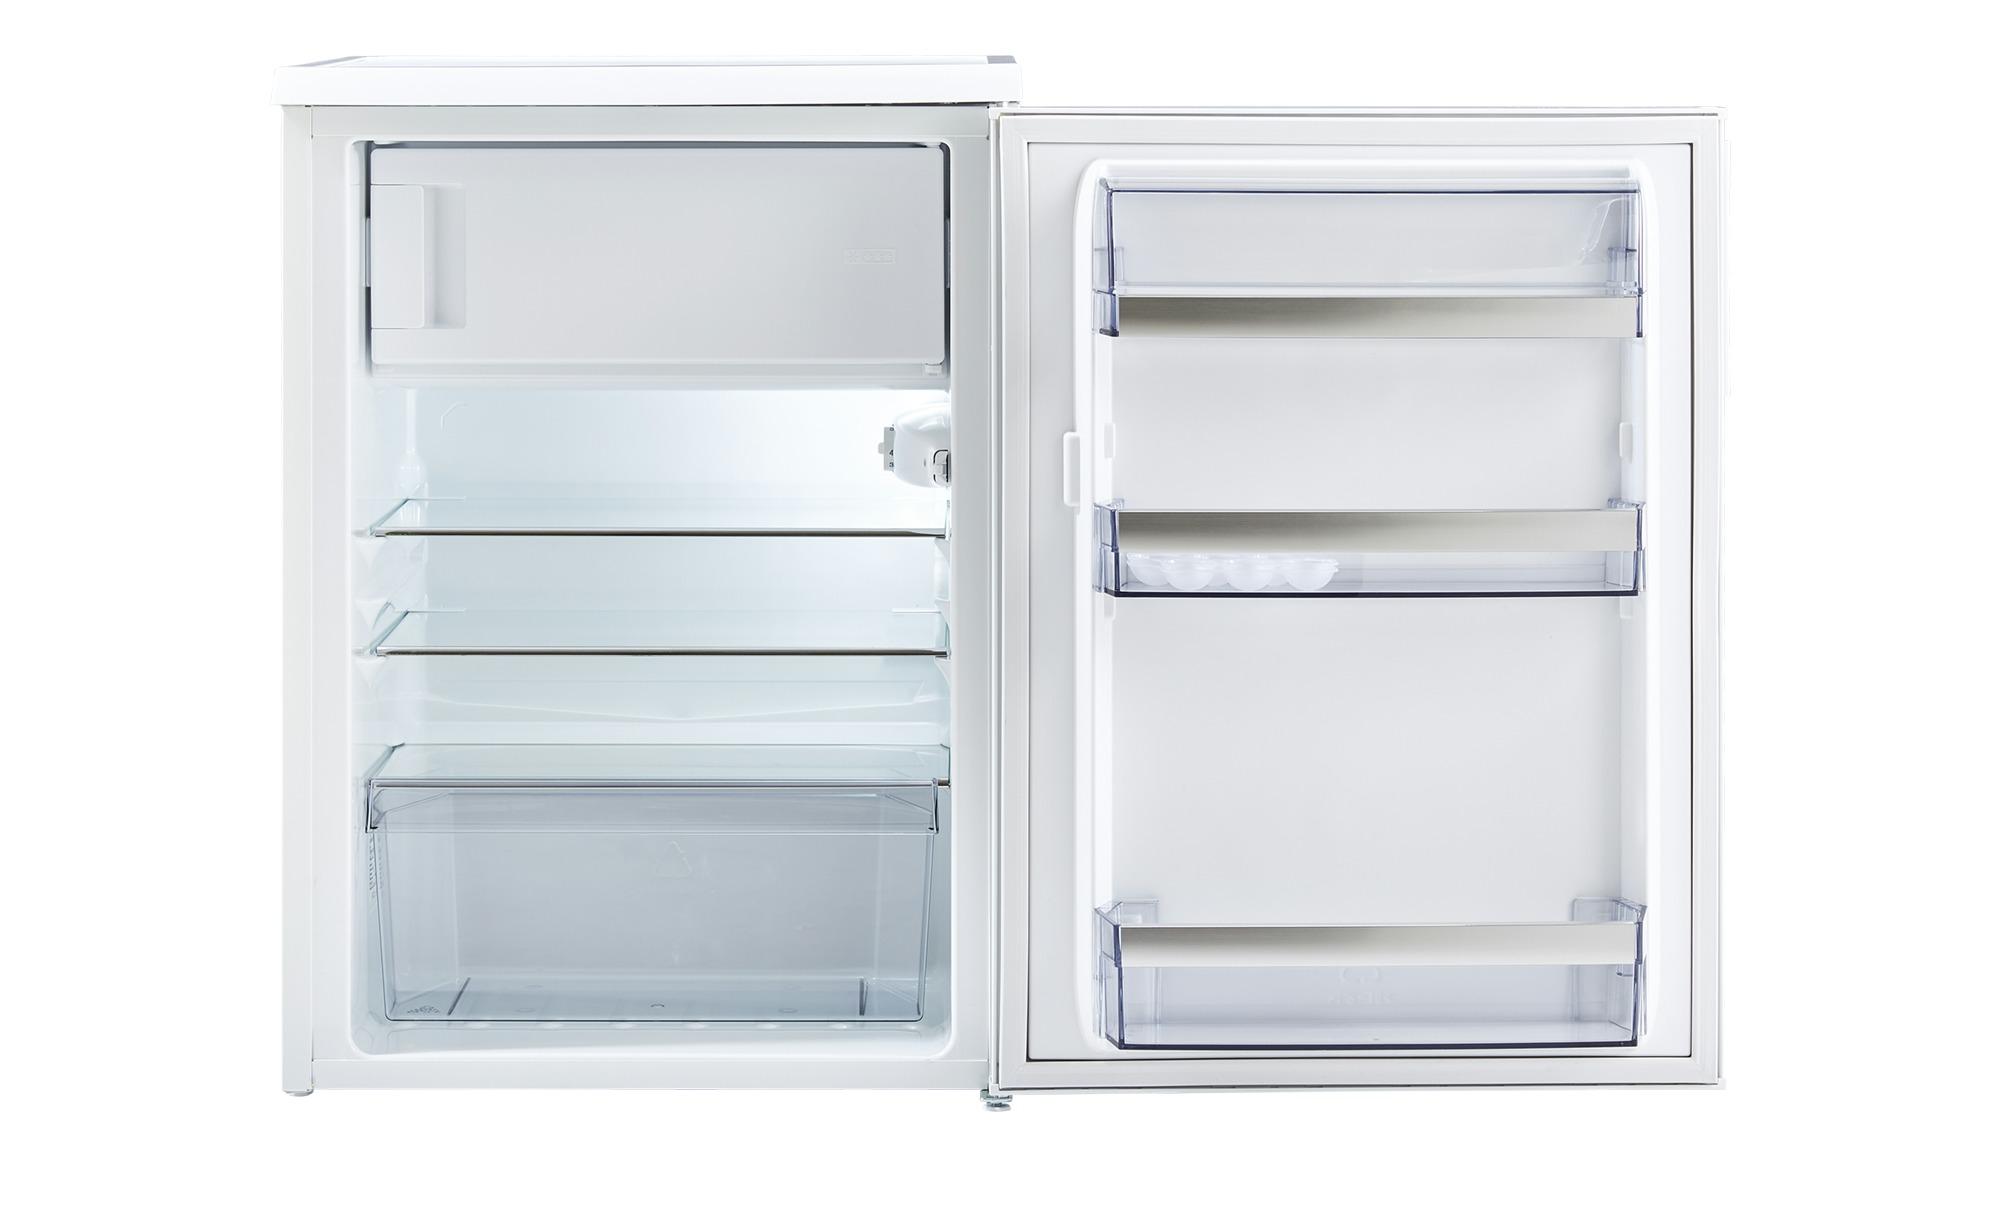 Aeg Kühlschrank 85 Cm : Aeg kühlschrank rtb81421aw bei möbel kraft online kaufen